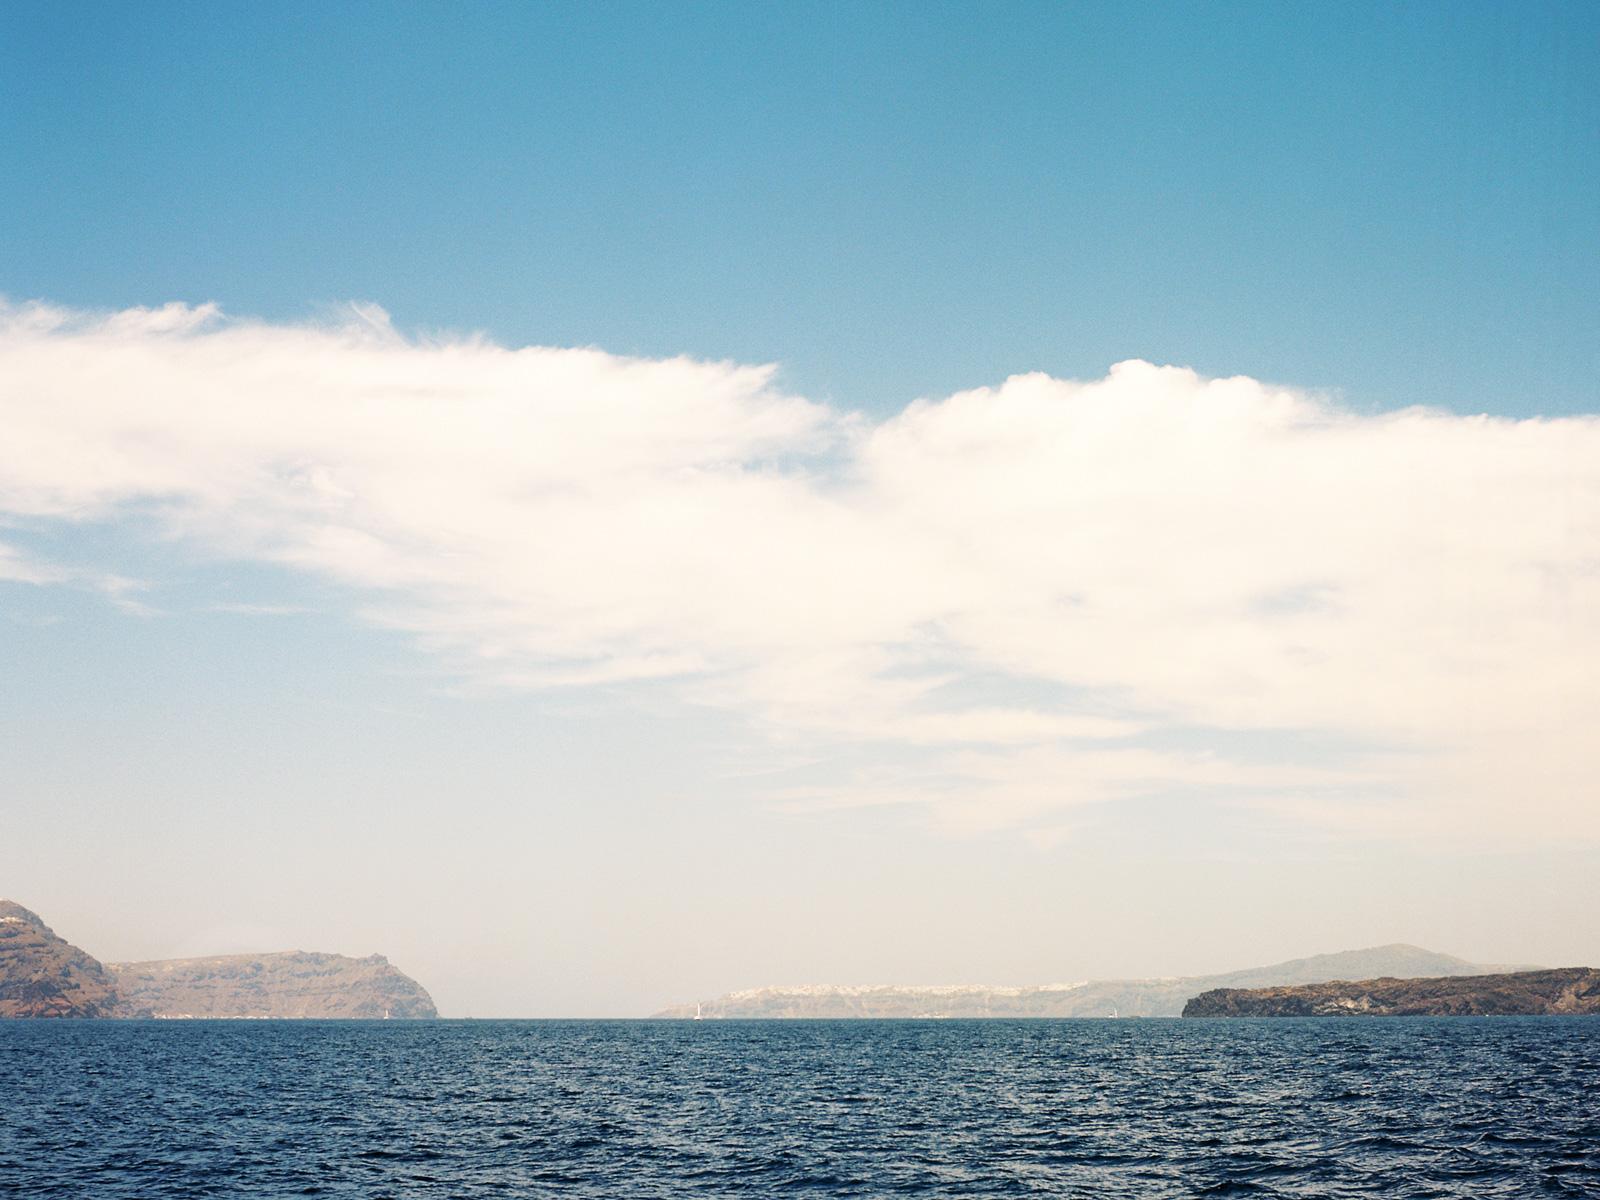 Greece_Yashicamat124g_18.jpg